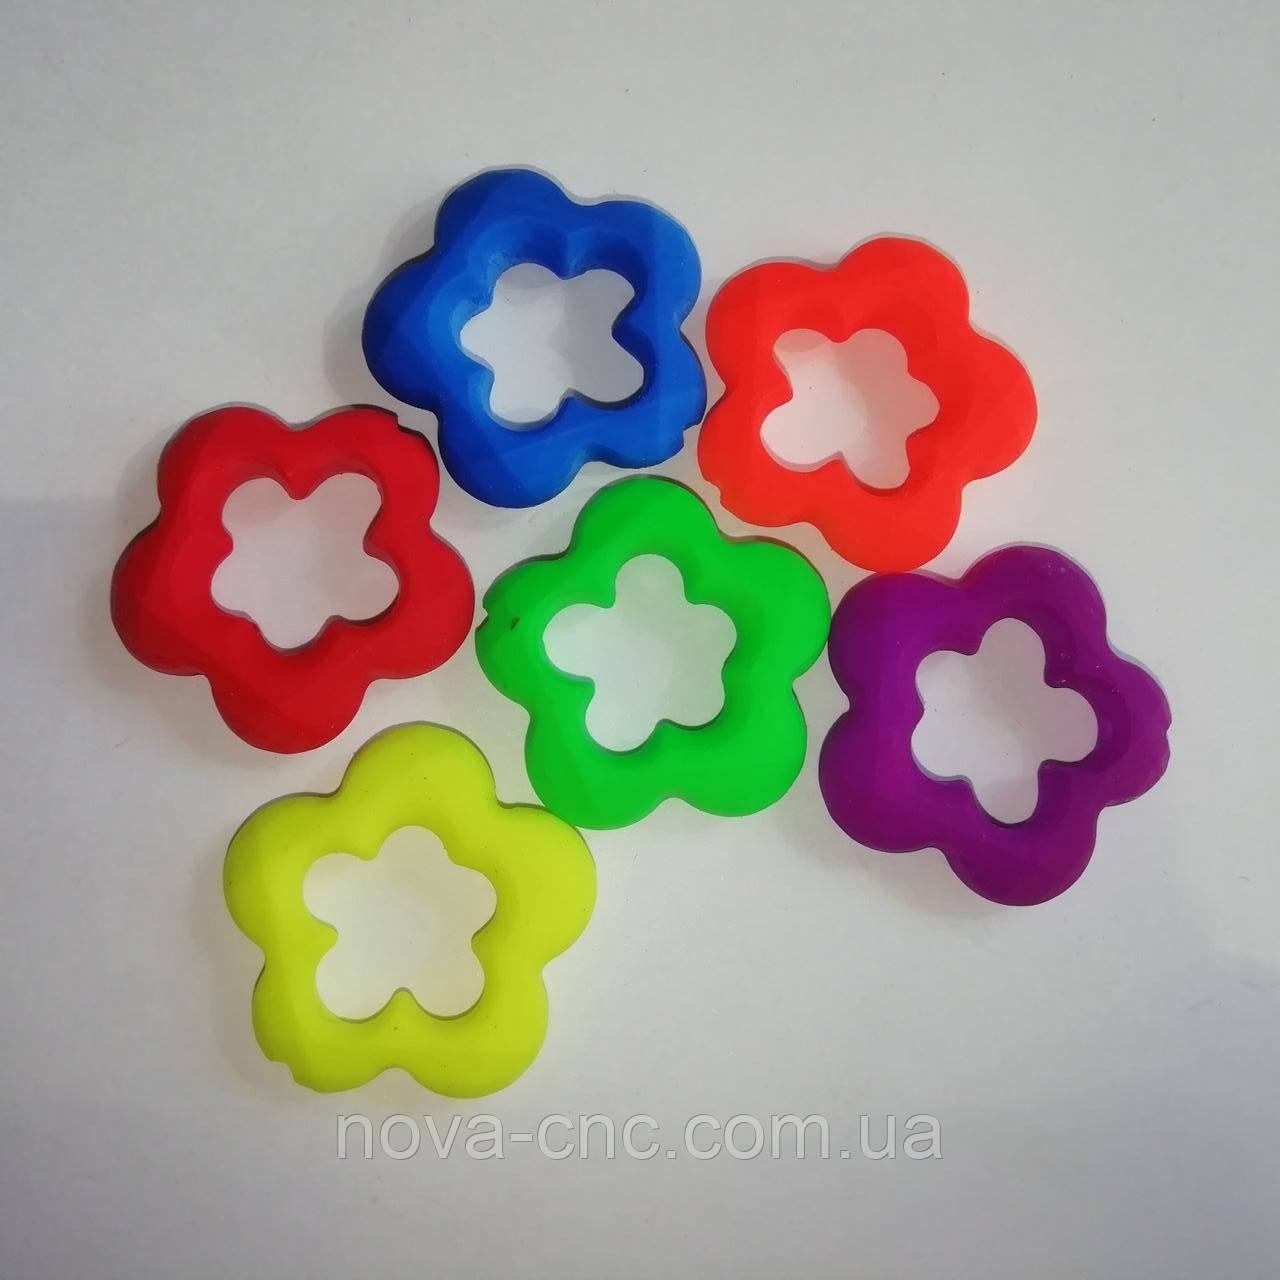 "Бусины пластик ""Цветы"" микс 30 мм"